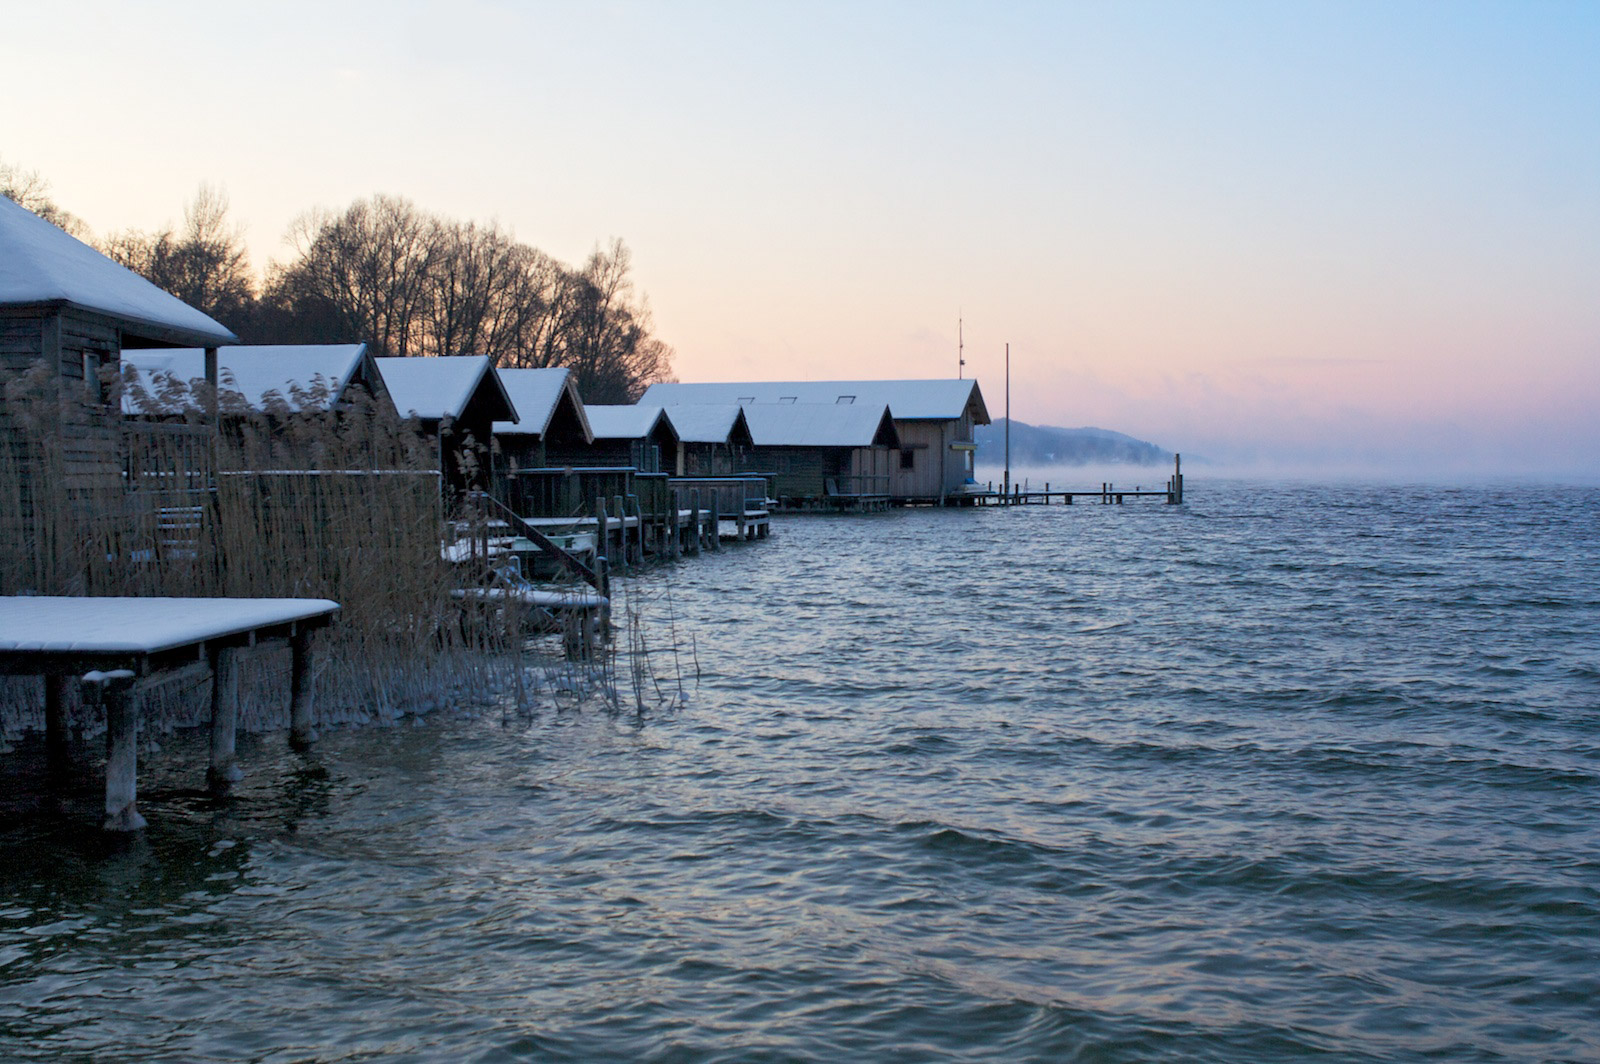 Bootshütten Percha rasch abkühlender See 20.12.jpg